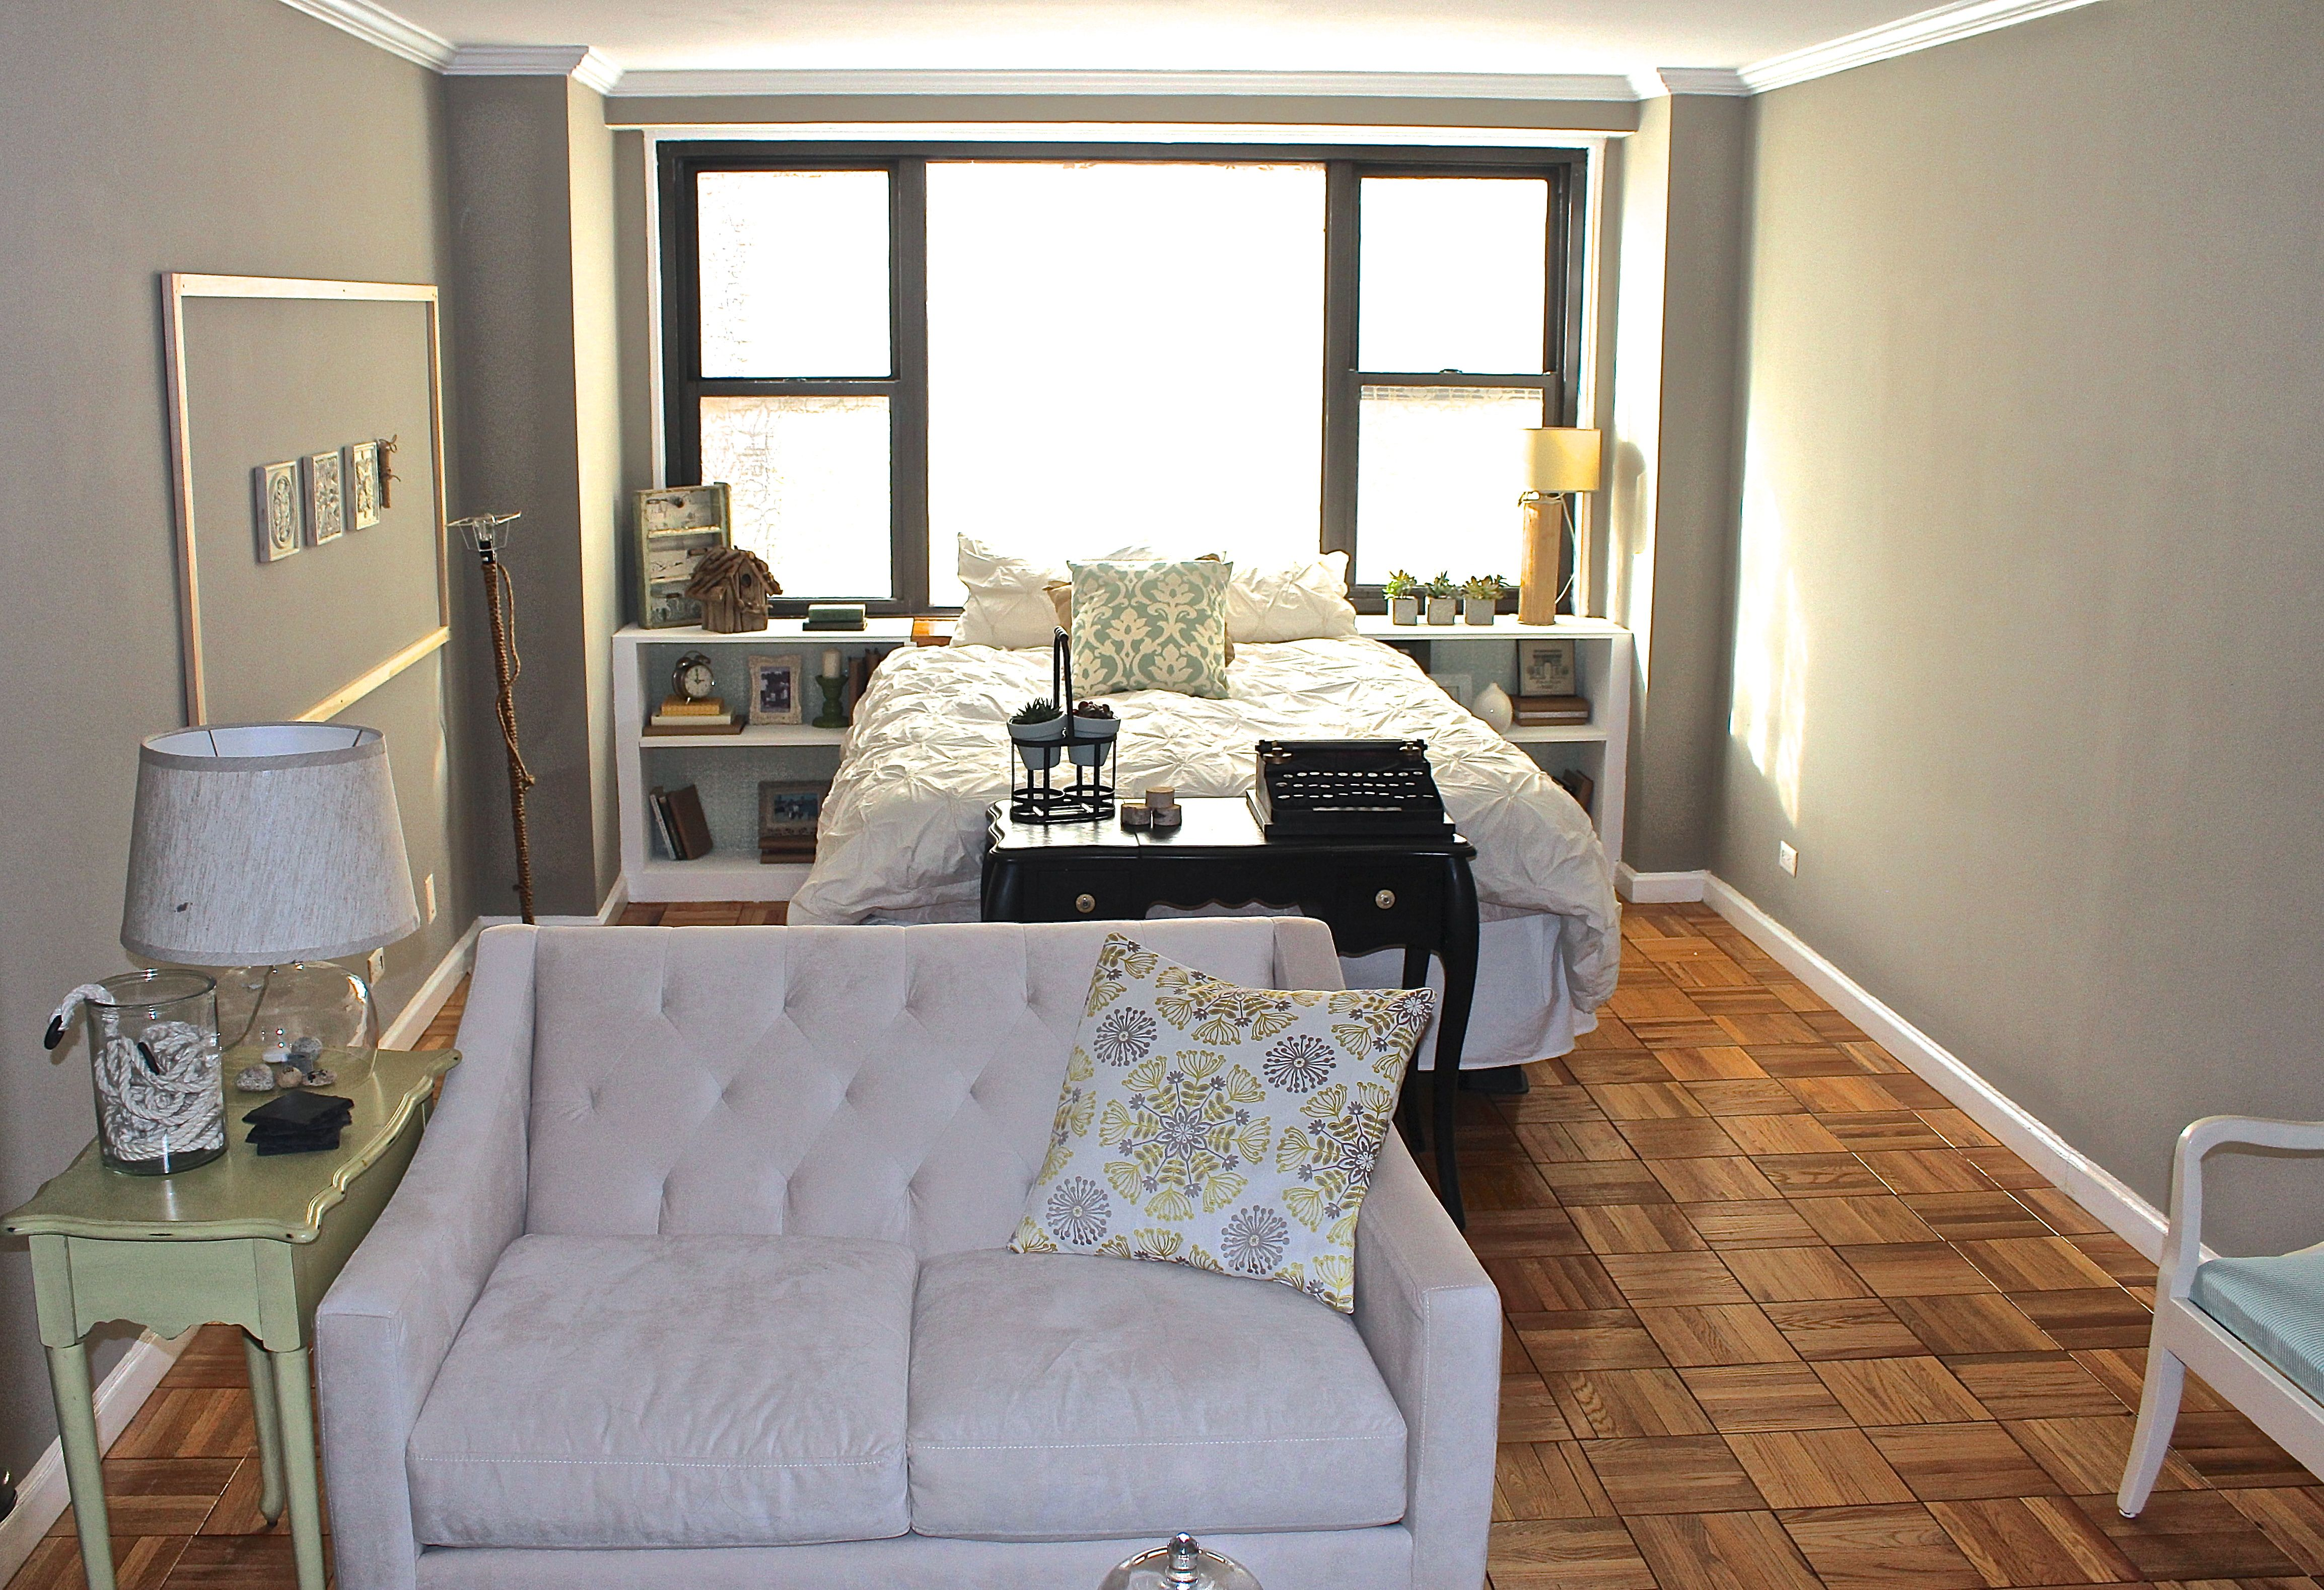 250 Sqf Efficiency Studio Apartment Living Room Decor